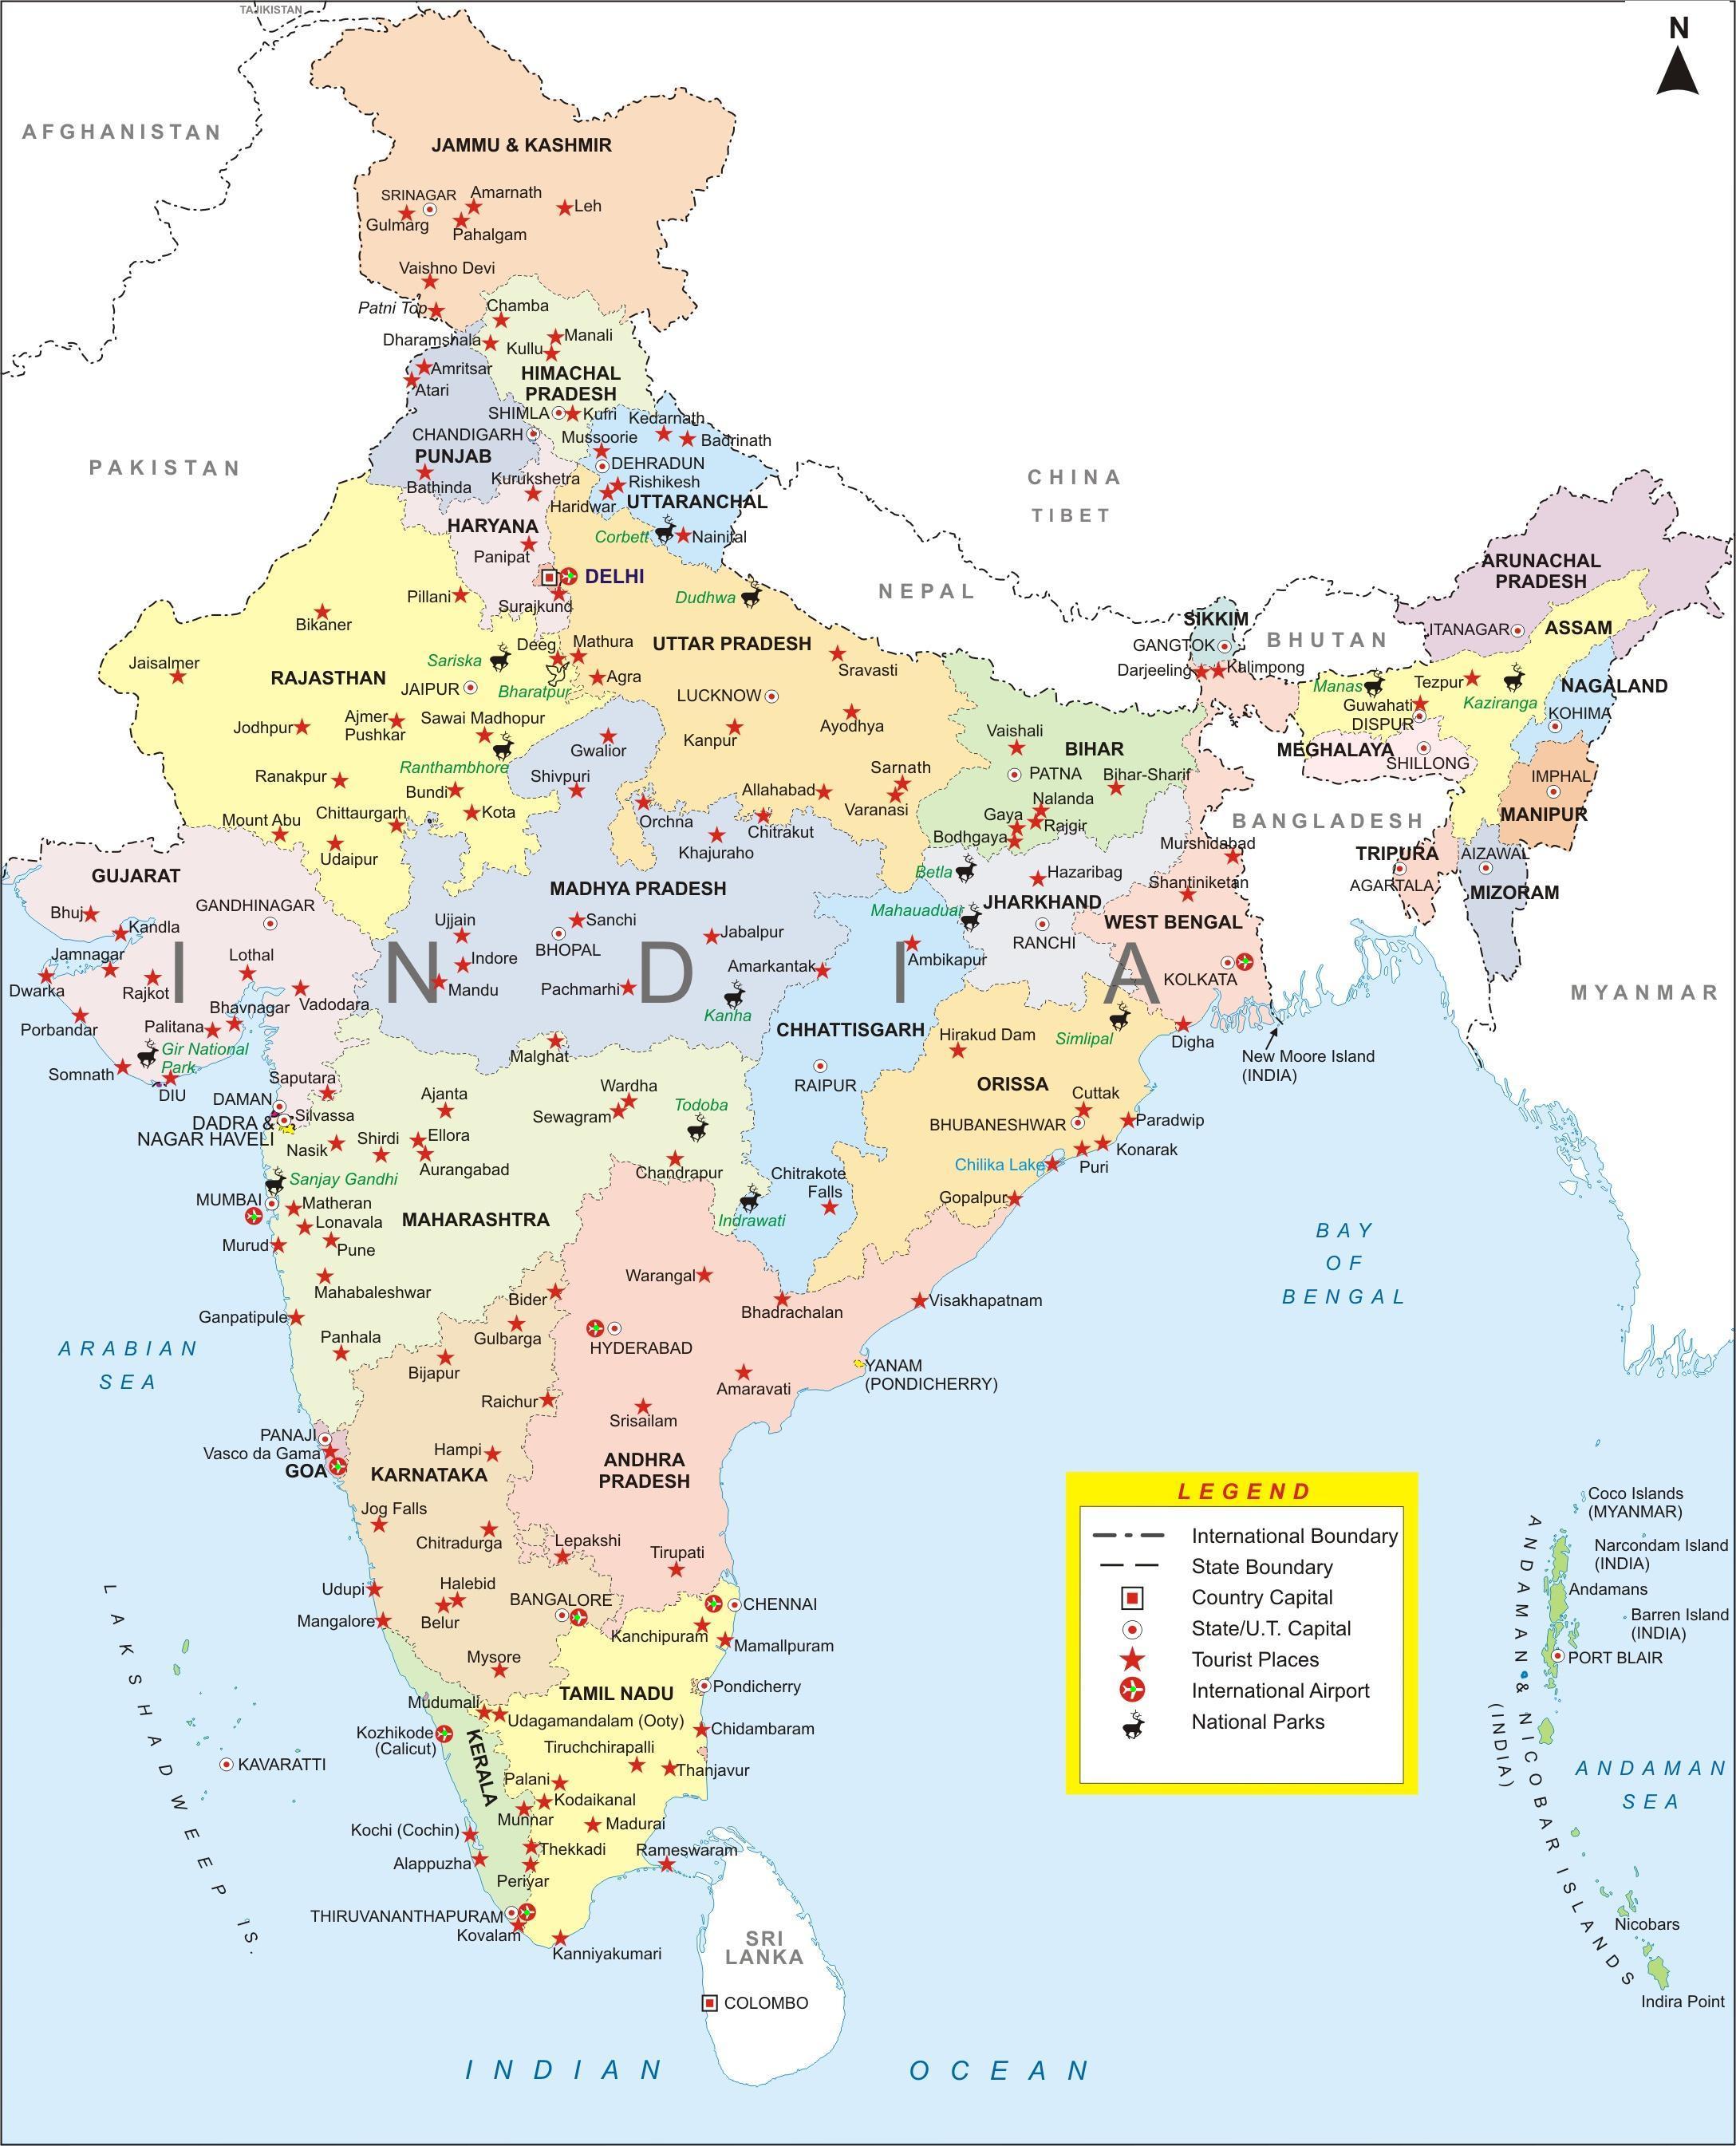 Navigation Maps India Image – India-city-map.jpg